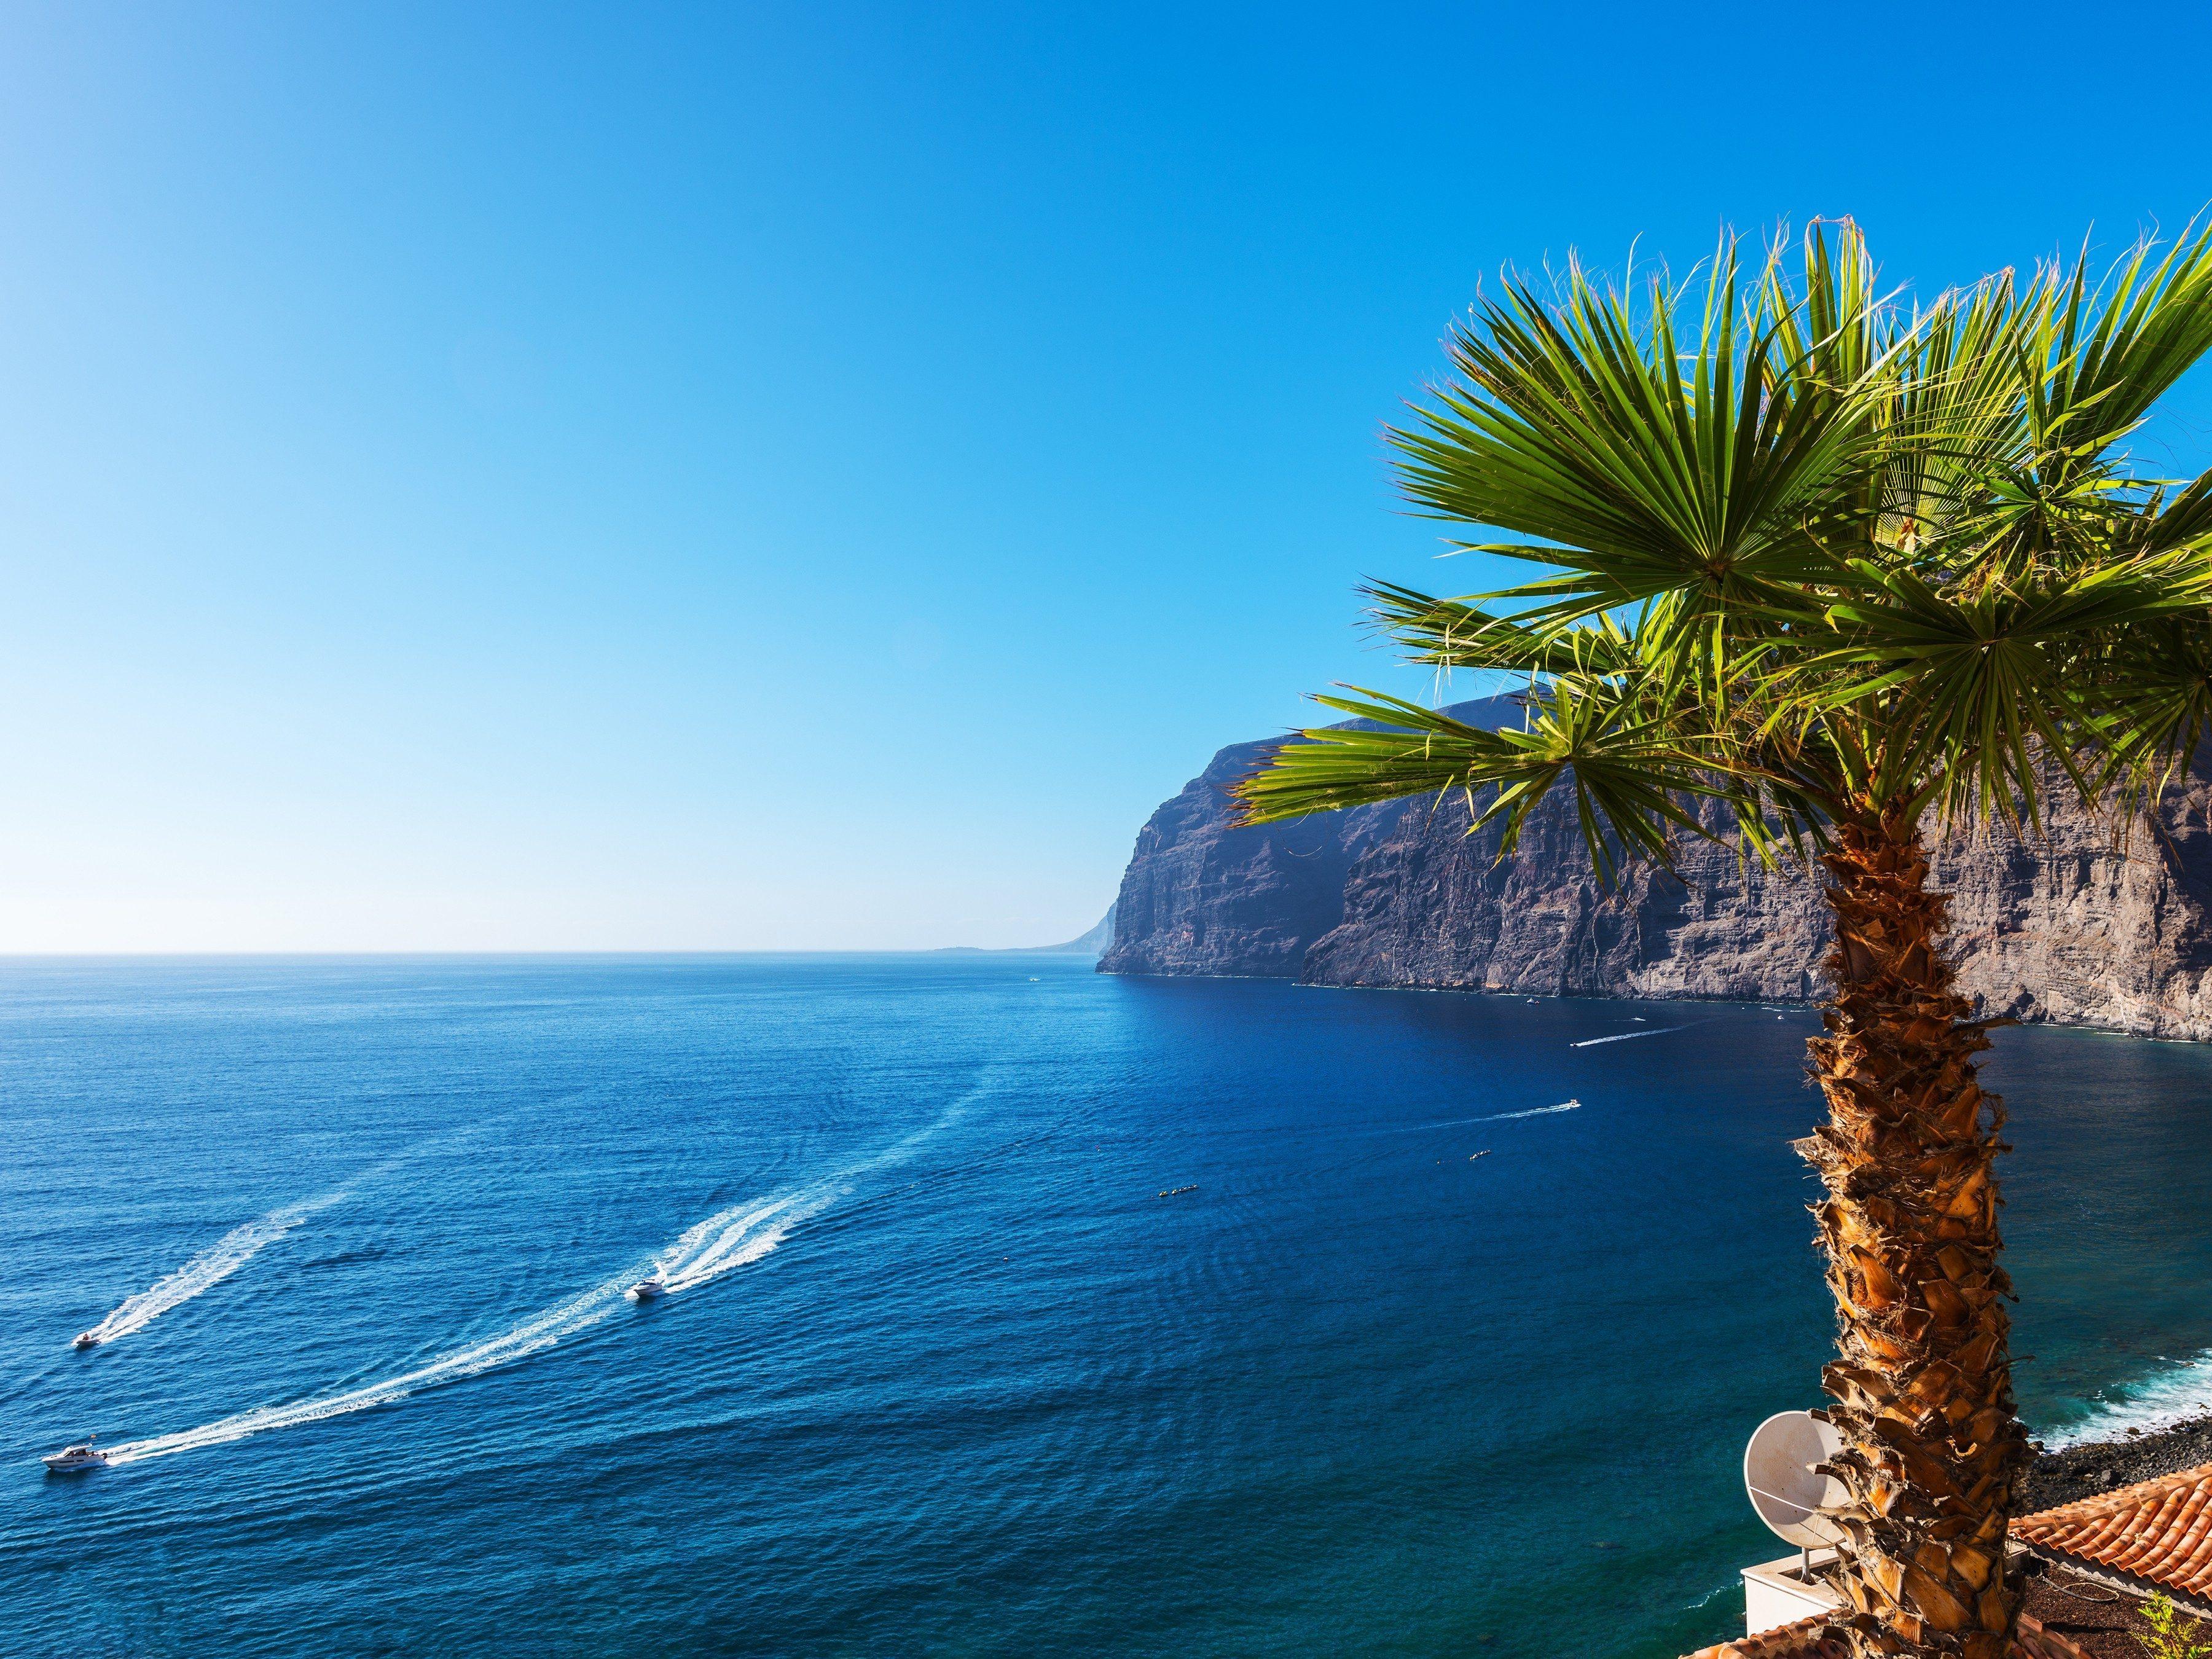 1. Canary Islands